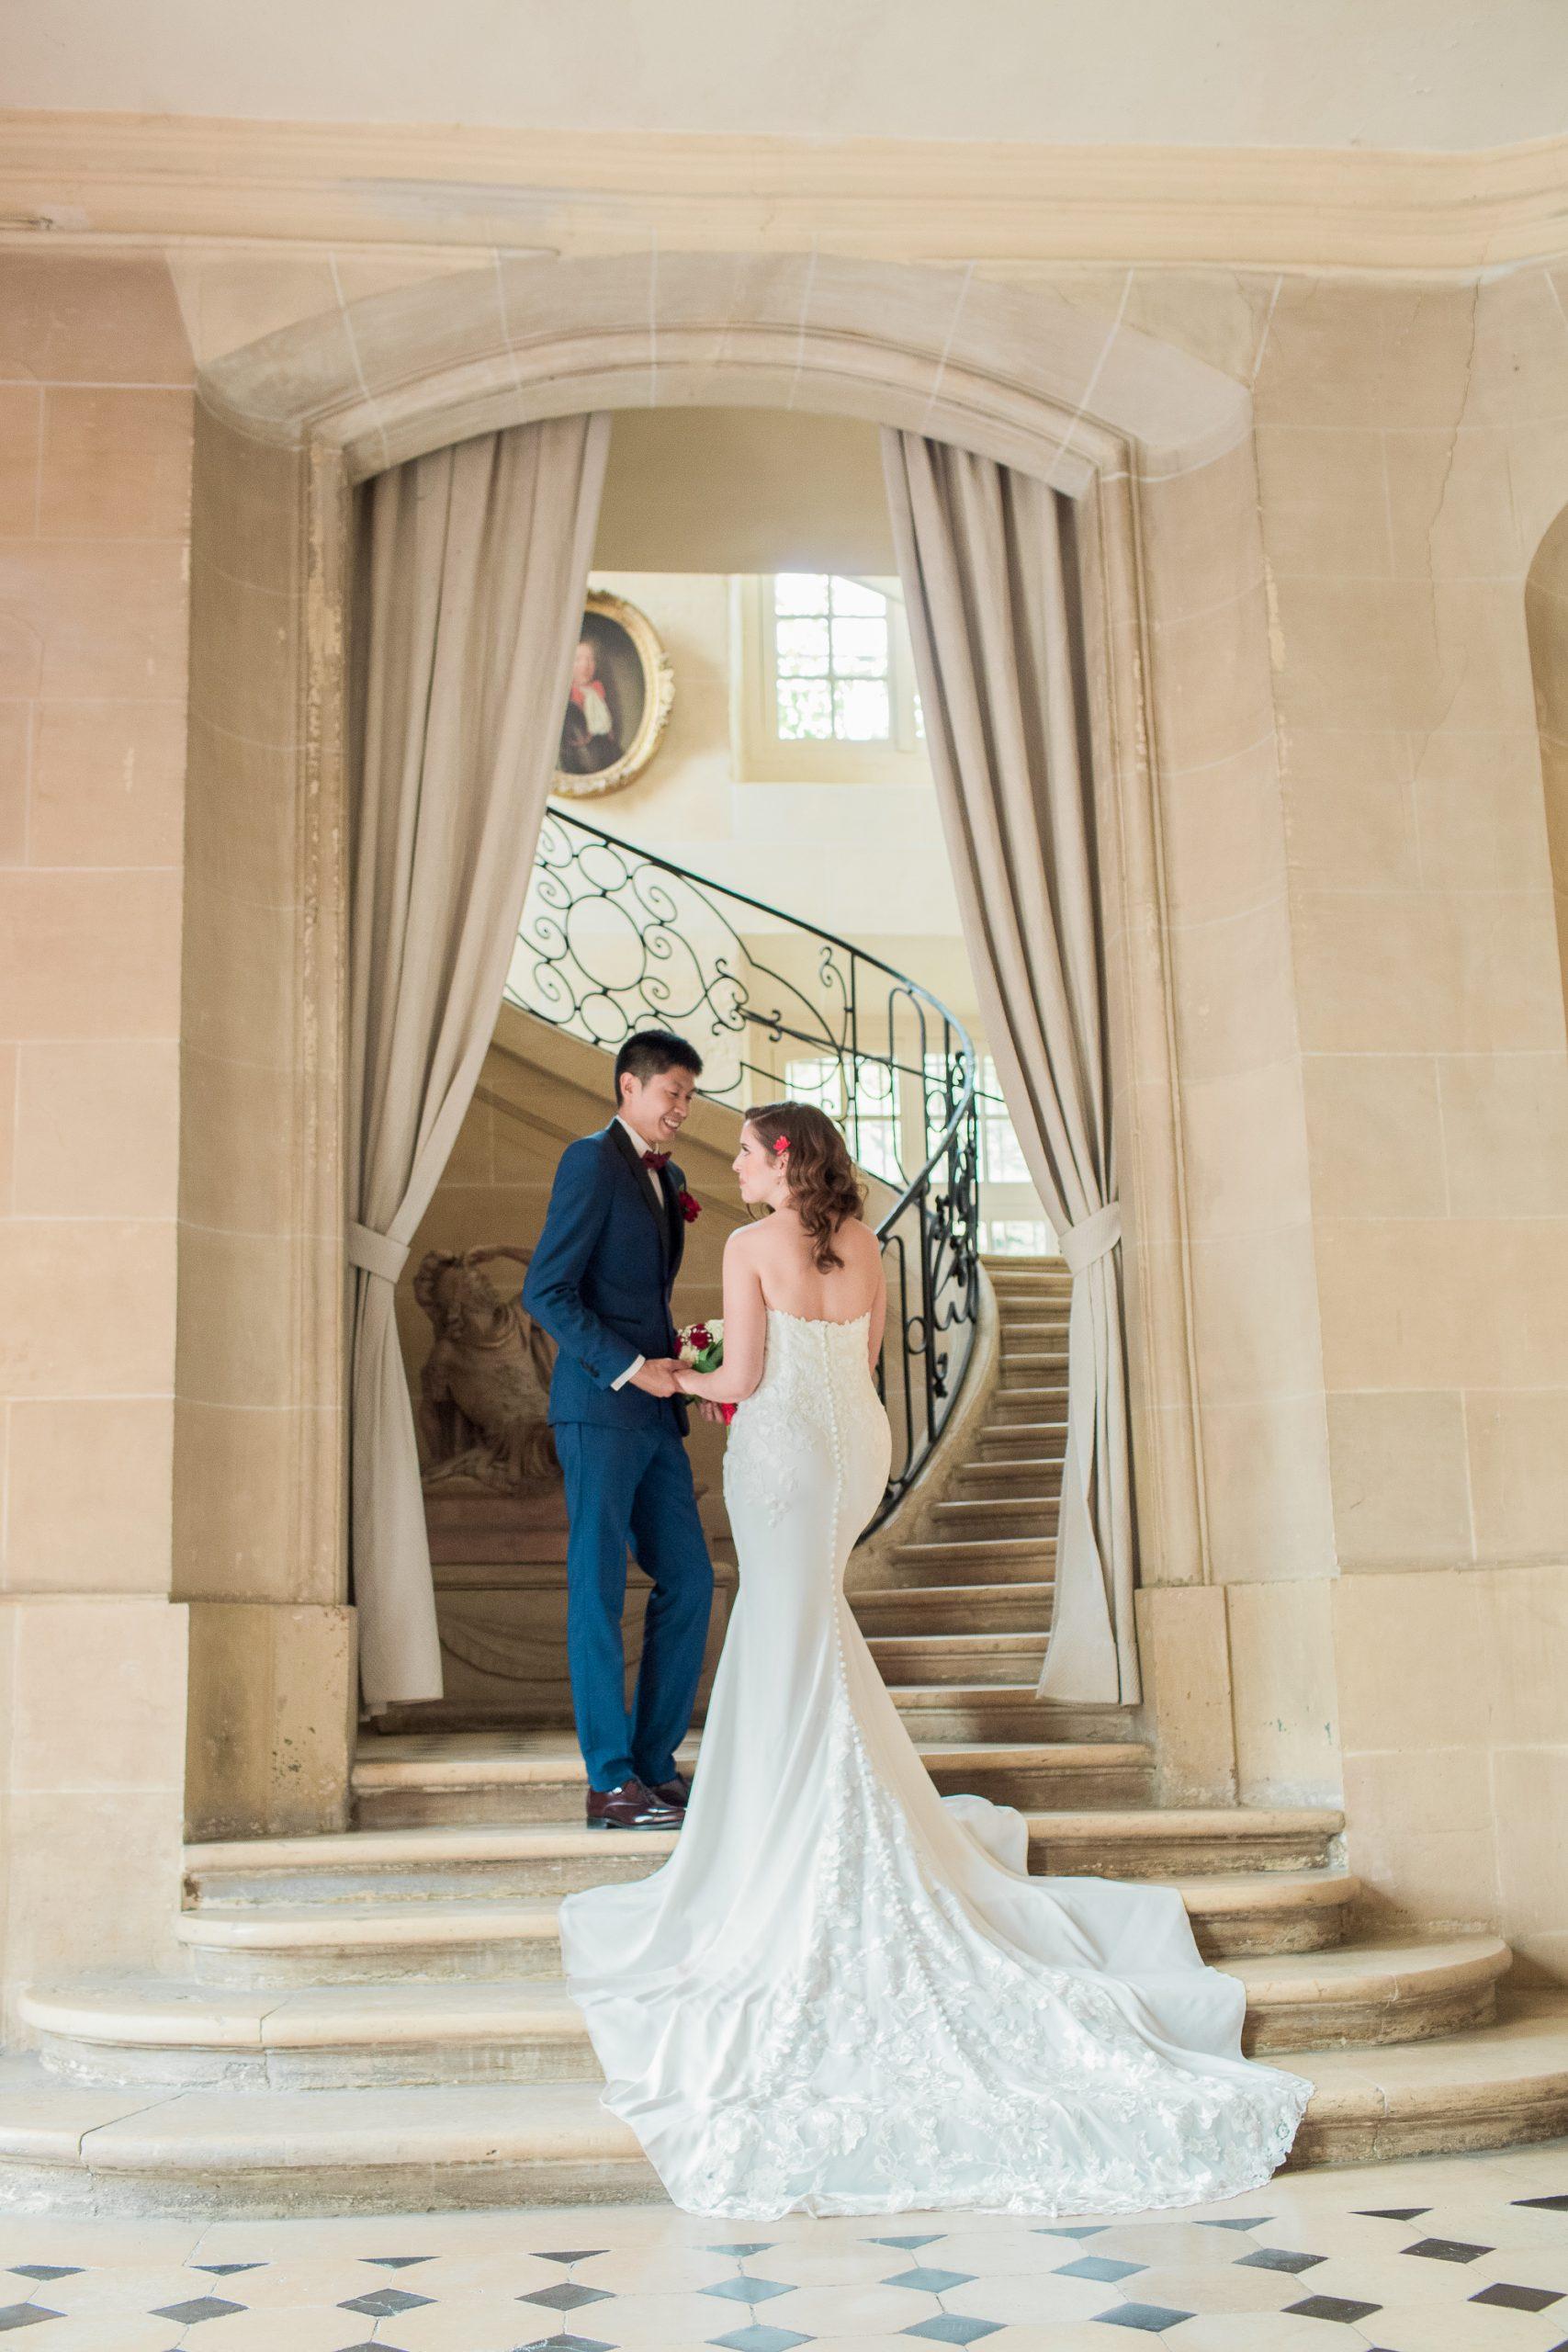 photographe-mariage-chateau-nandy-photo-couple-interieur